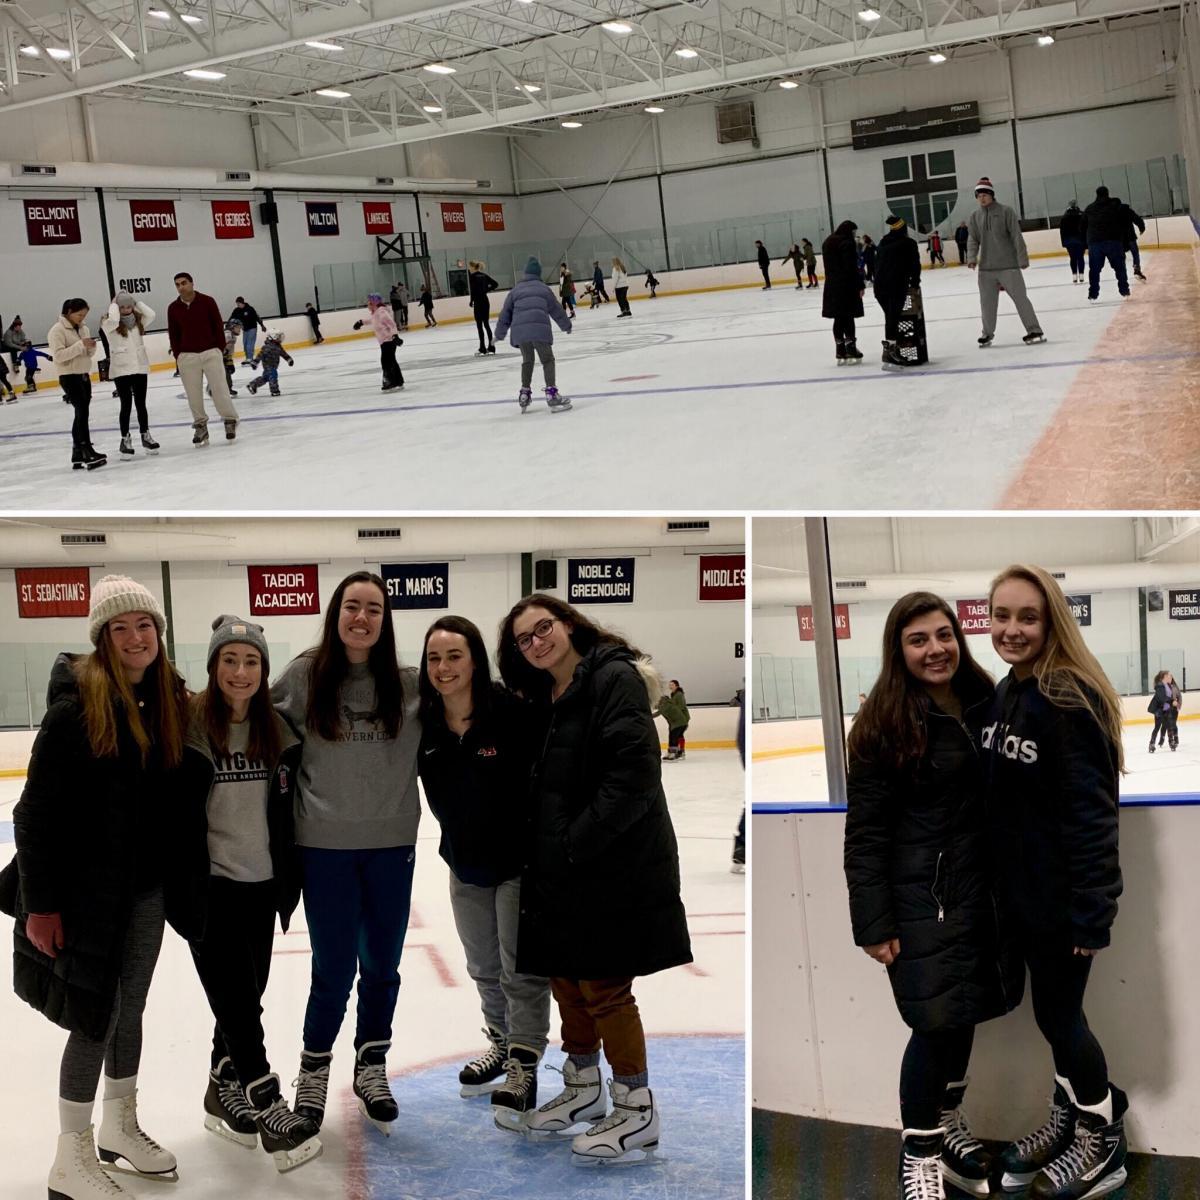 Brooks skating